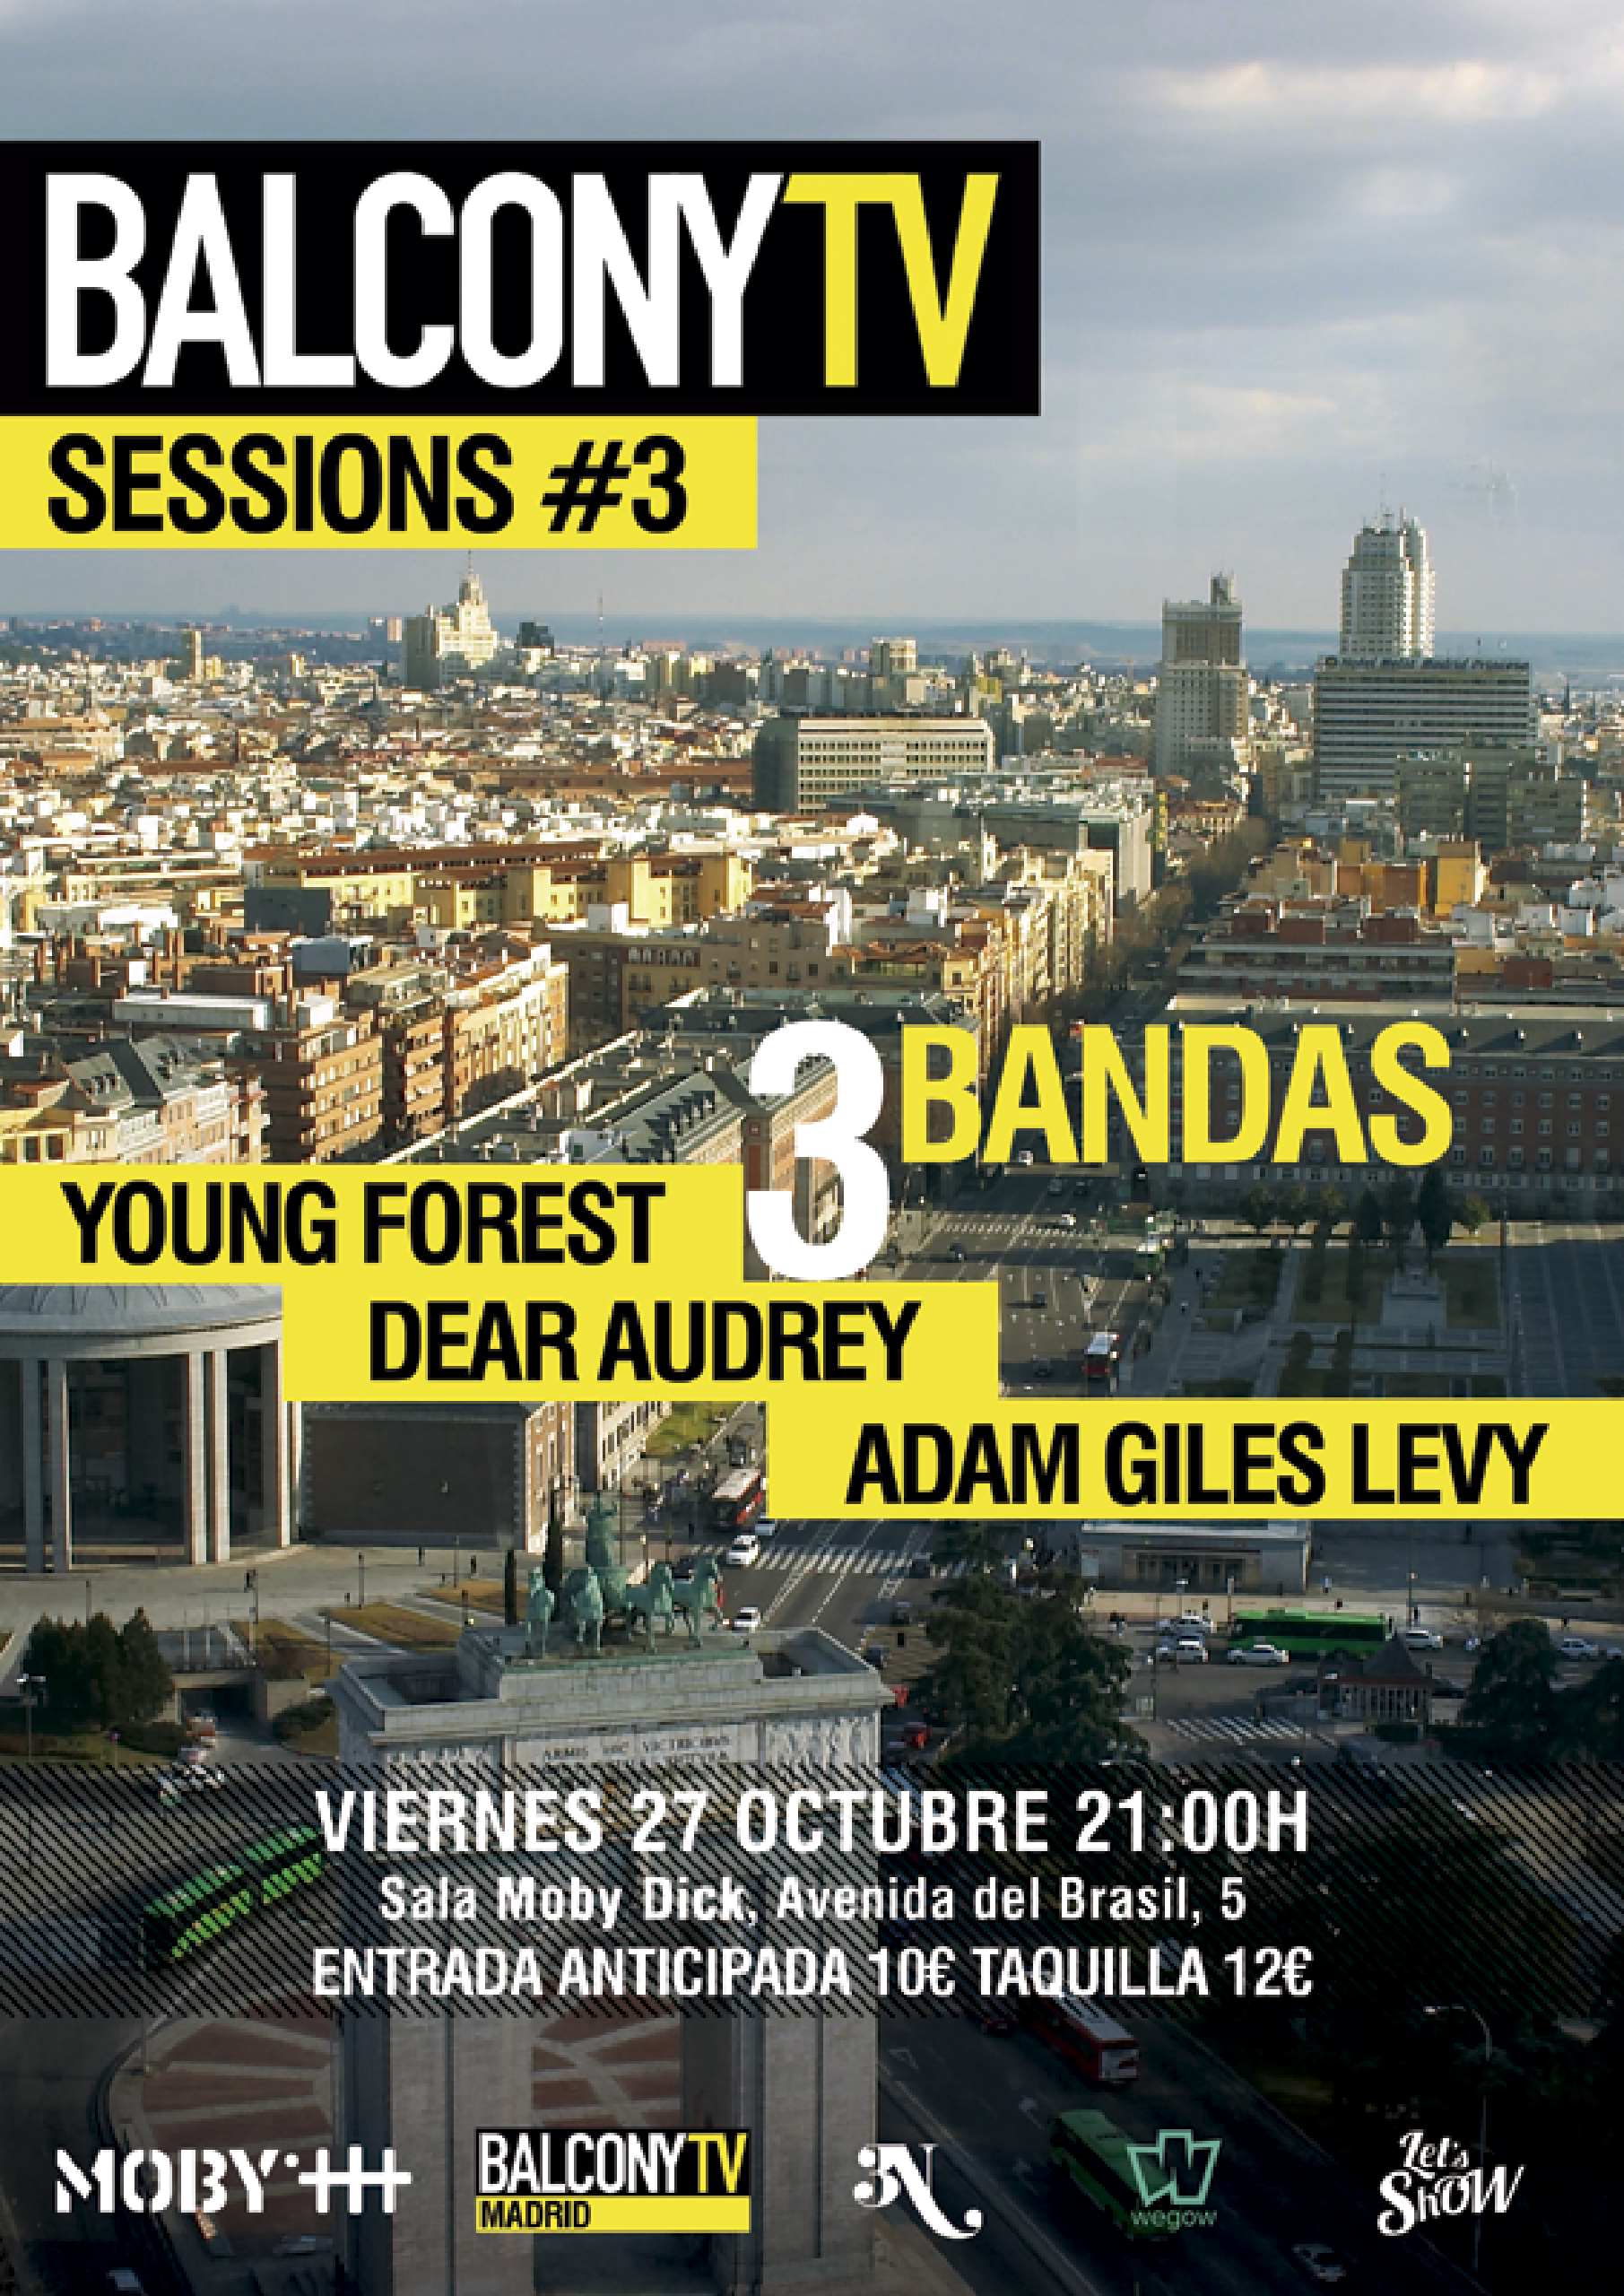 BalconyTV Sessions #3